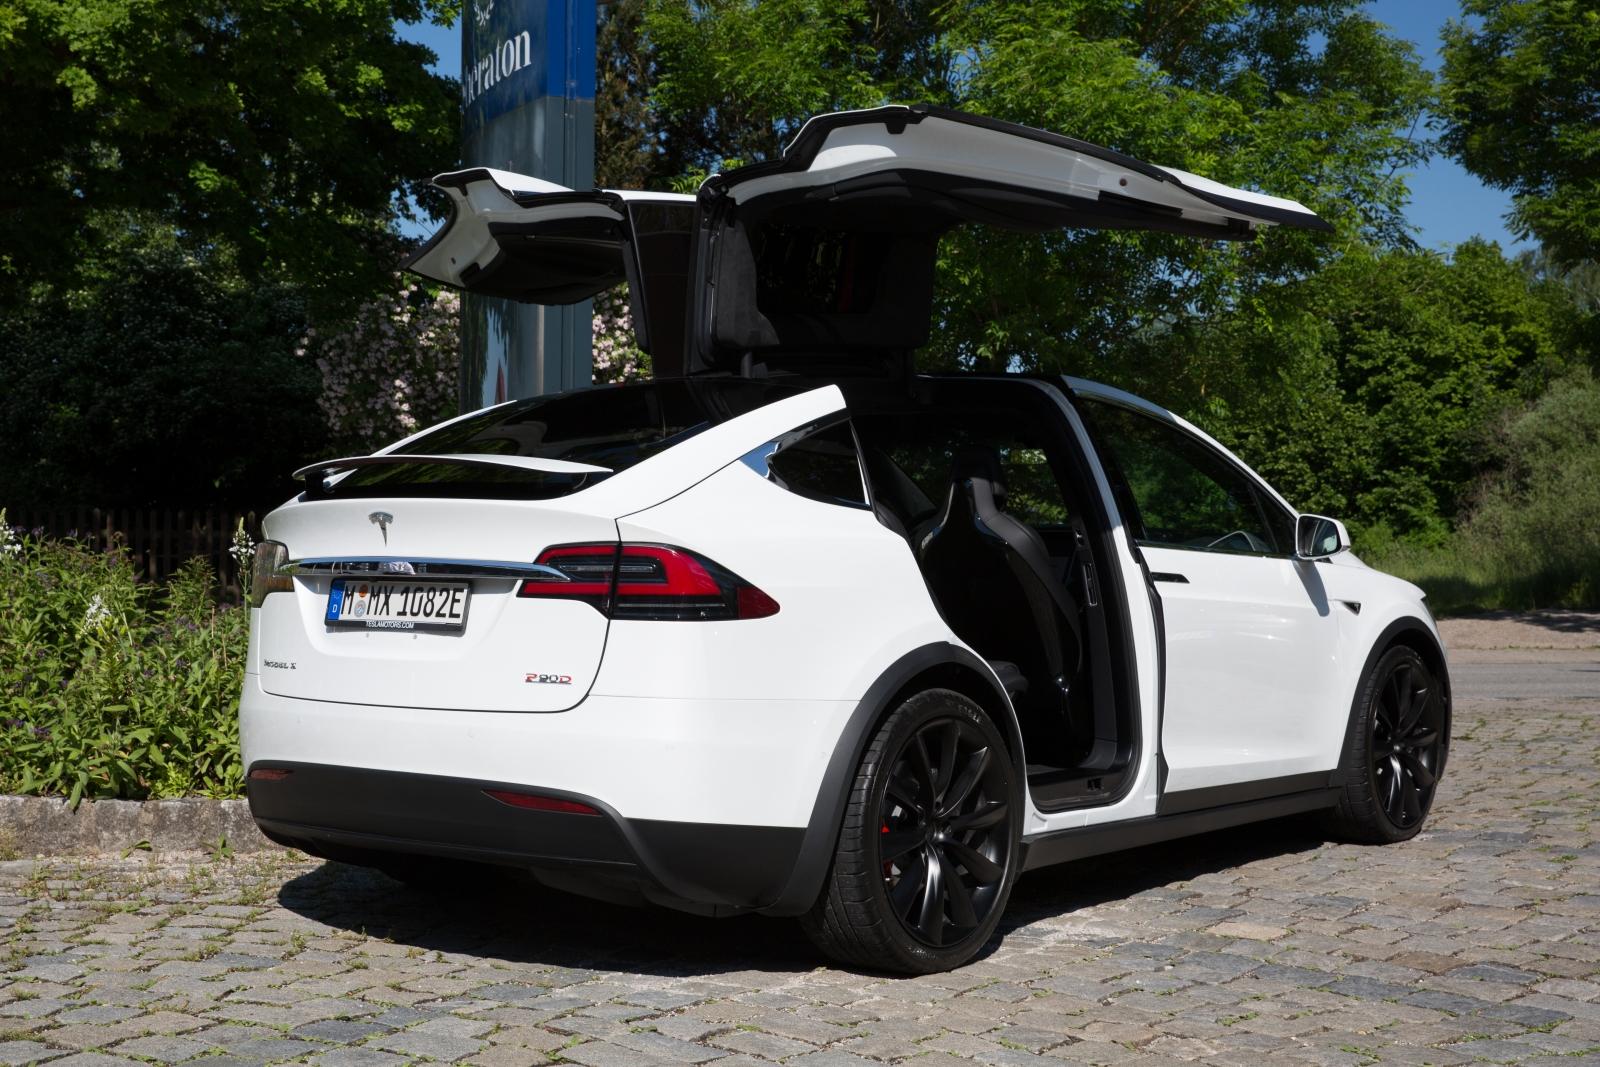 Lemon Law California >> 'Lemon law' helps man sell faulty Model X back to Tesla ...